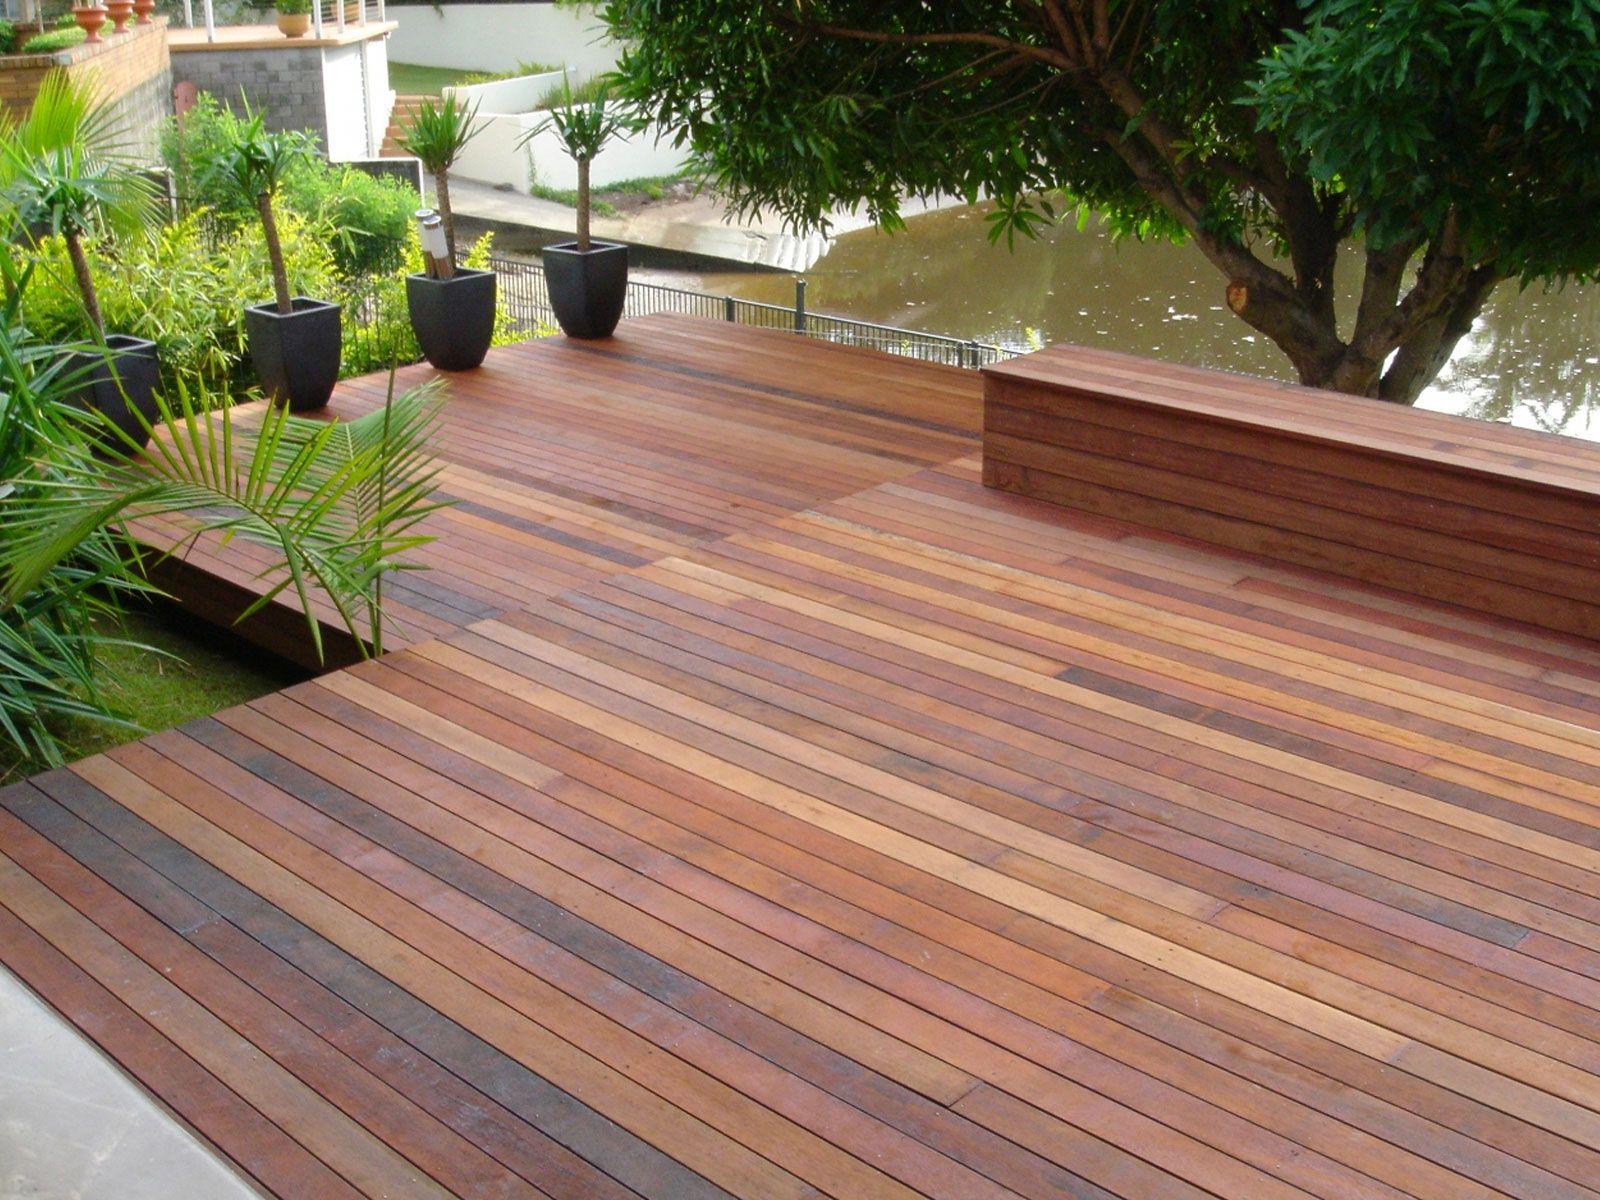 Gallery Timber Flooring Decking Screening Bamboo